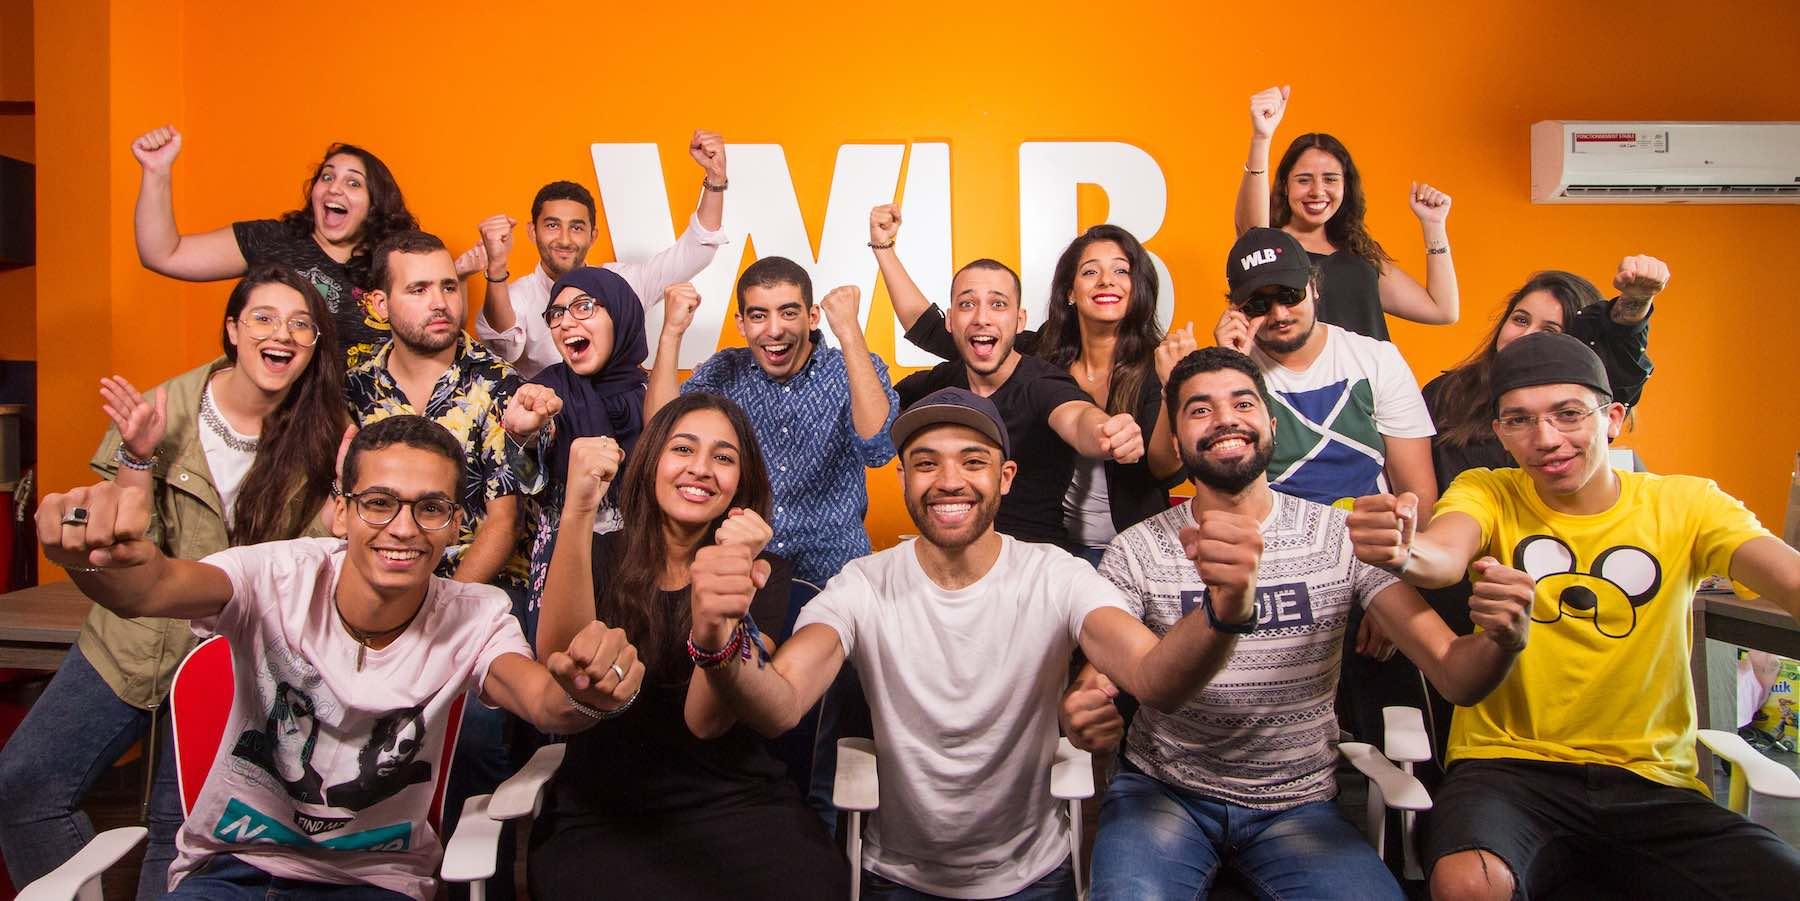 Welovebuzz : Après le Maroc, l'Egypte